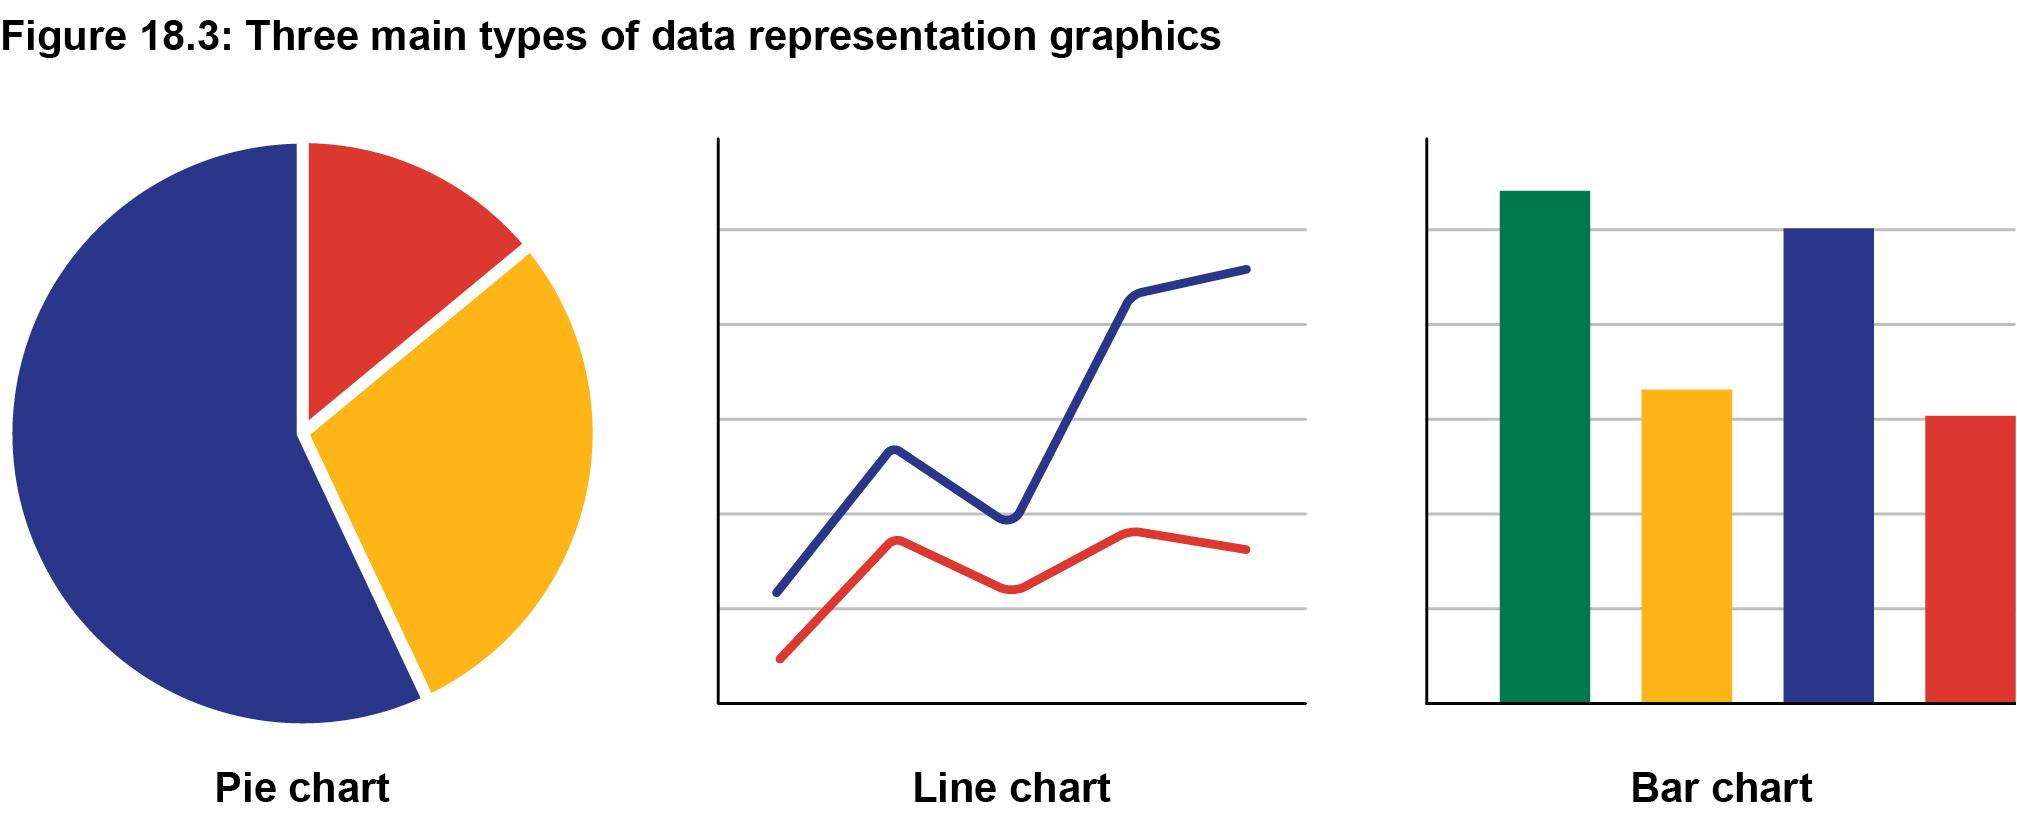 Figure 18.3: Three main types of data representation graphics